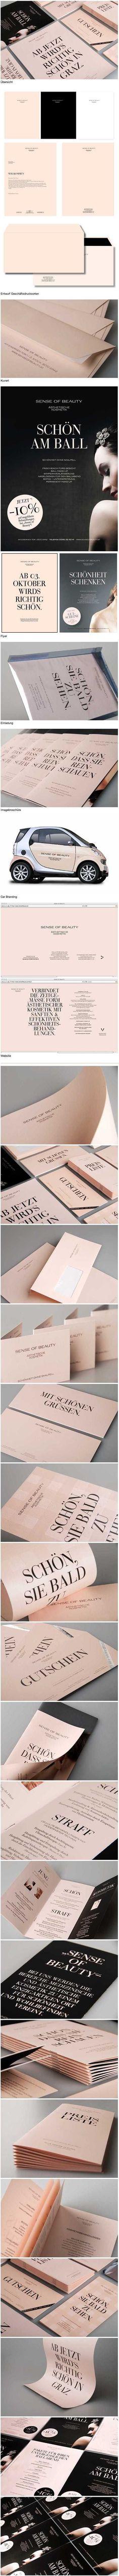 Sense of Beauty Branding by Moodley | Fivestar Branding Agency – Design and Branding Agency & Curated Inspiration Gallery